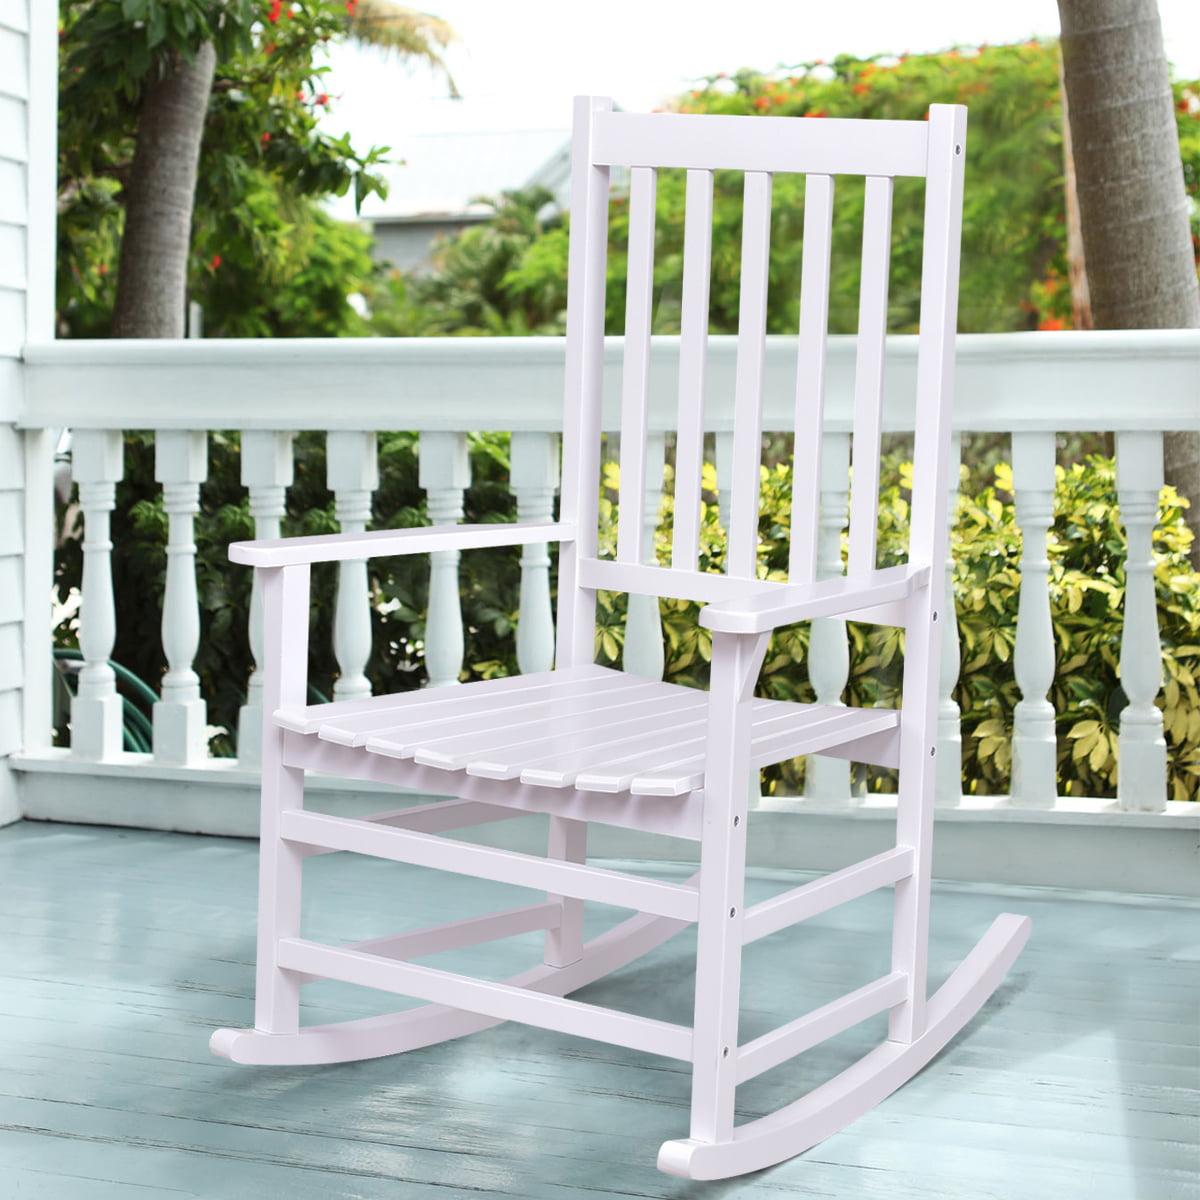 Costway Solid Wood Rocking Chair Rocker Porch Indoor Outdoor Patio Furniture White